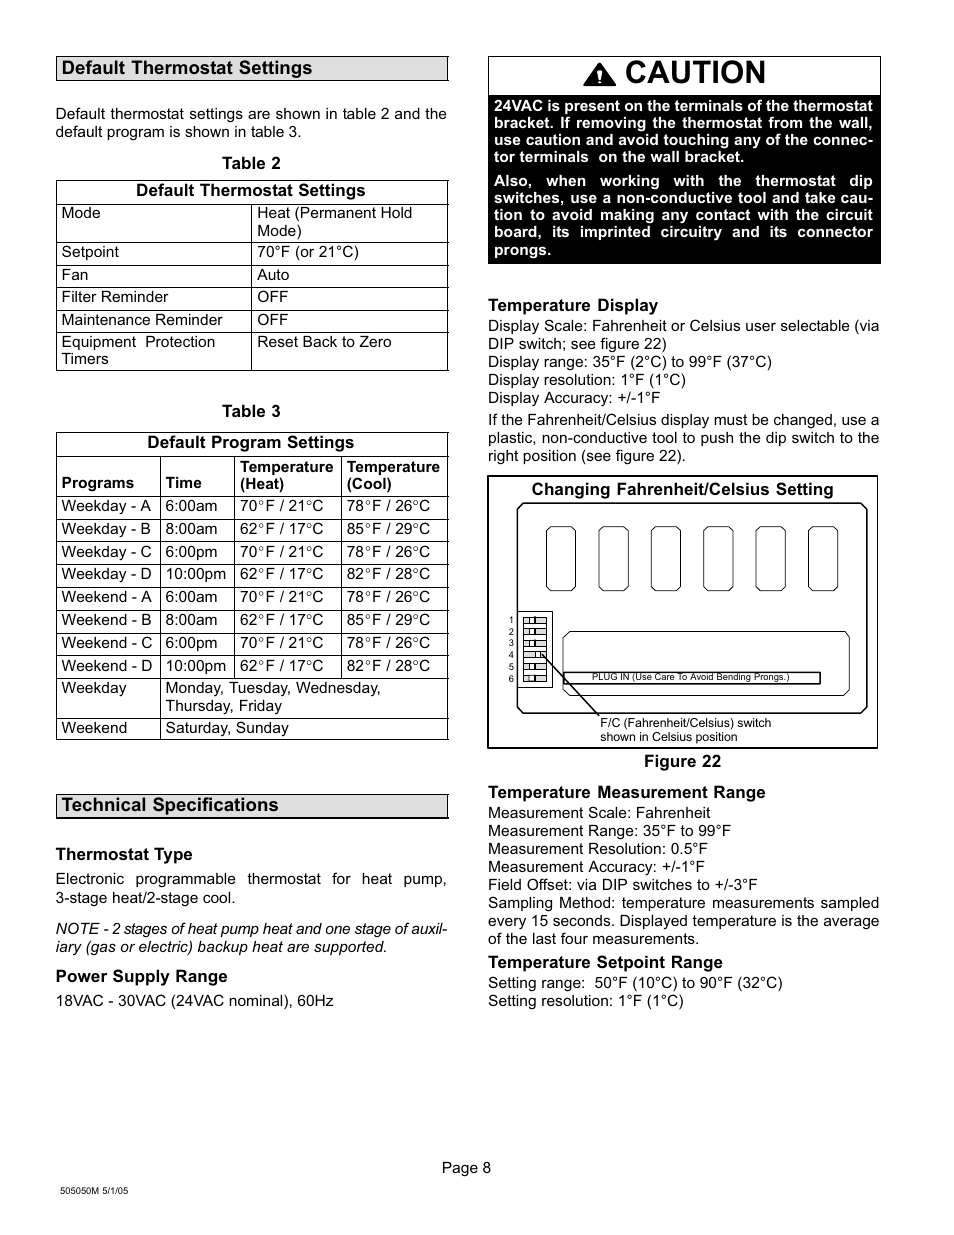 caution lennox international inc 51m37 user manual page 8 54 rh manualsdir com lennox yt1ff user manual lennox yt1ff user manual